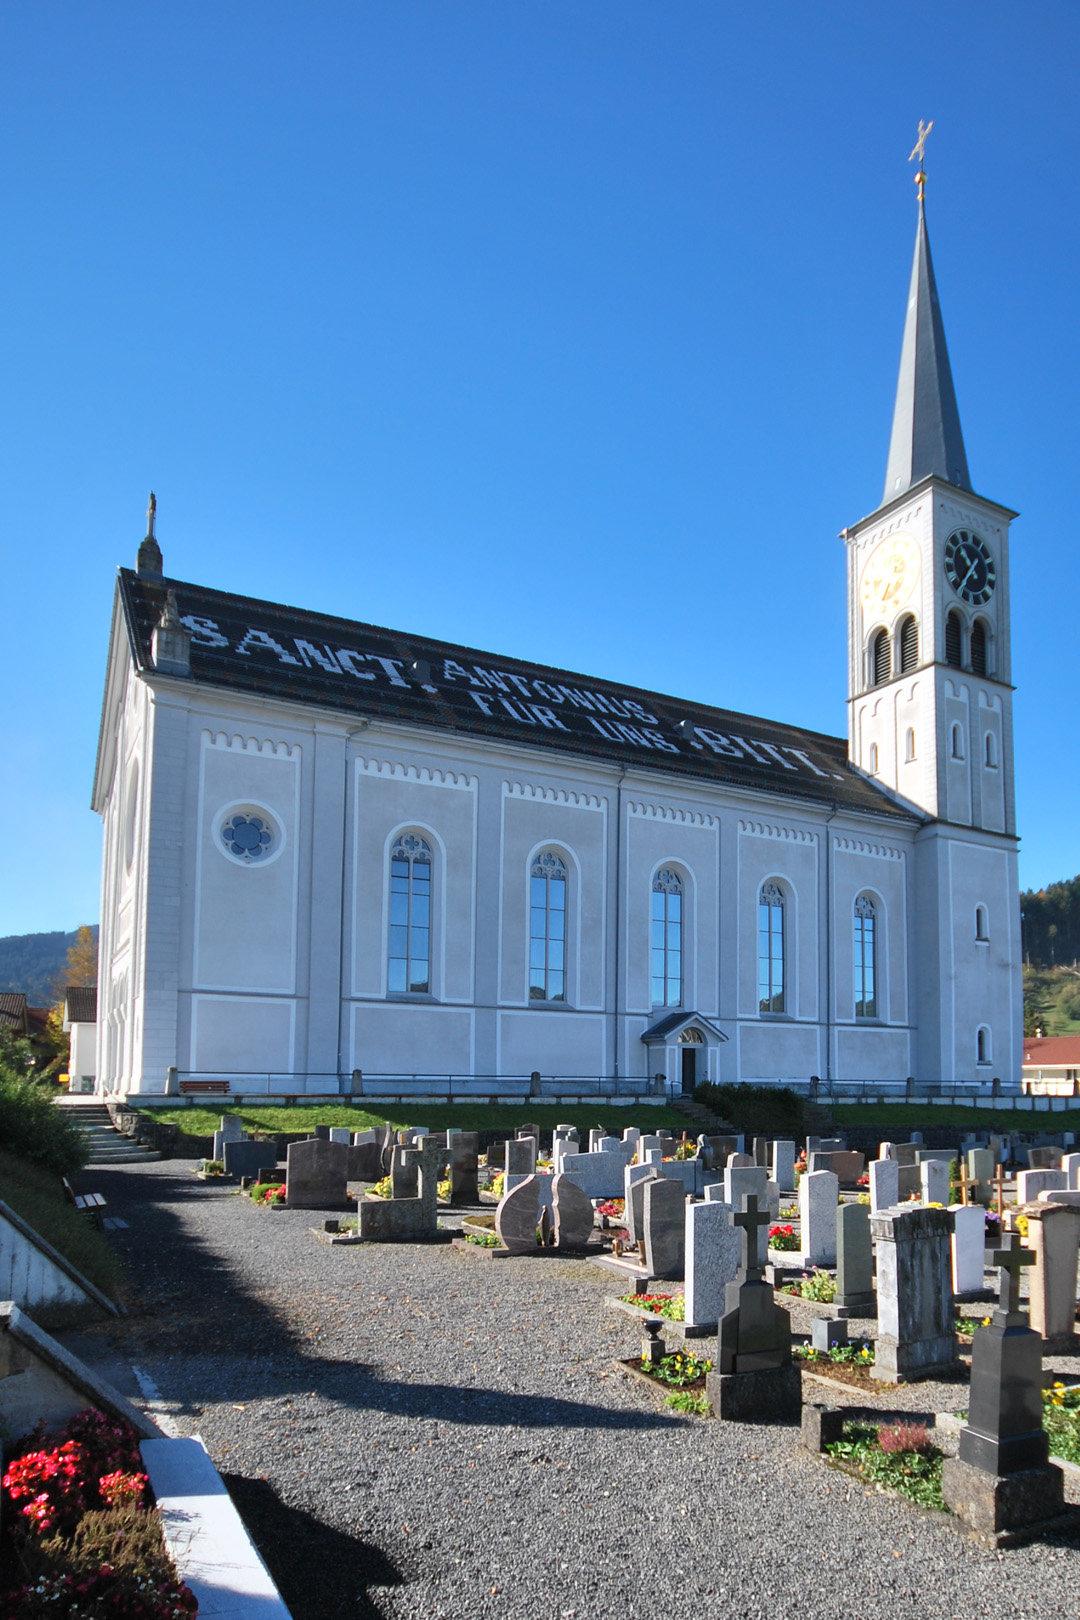 St. Anthony Parish Church